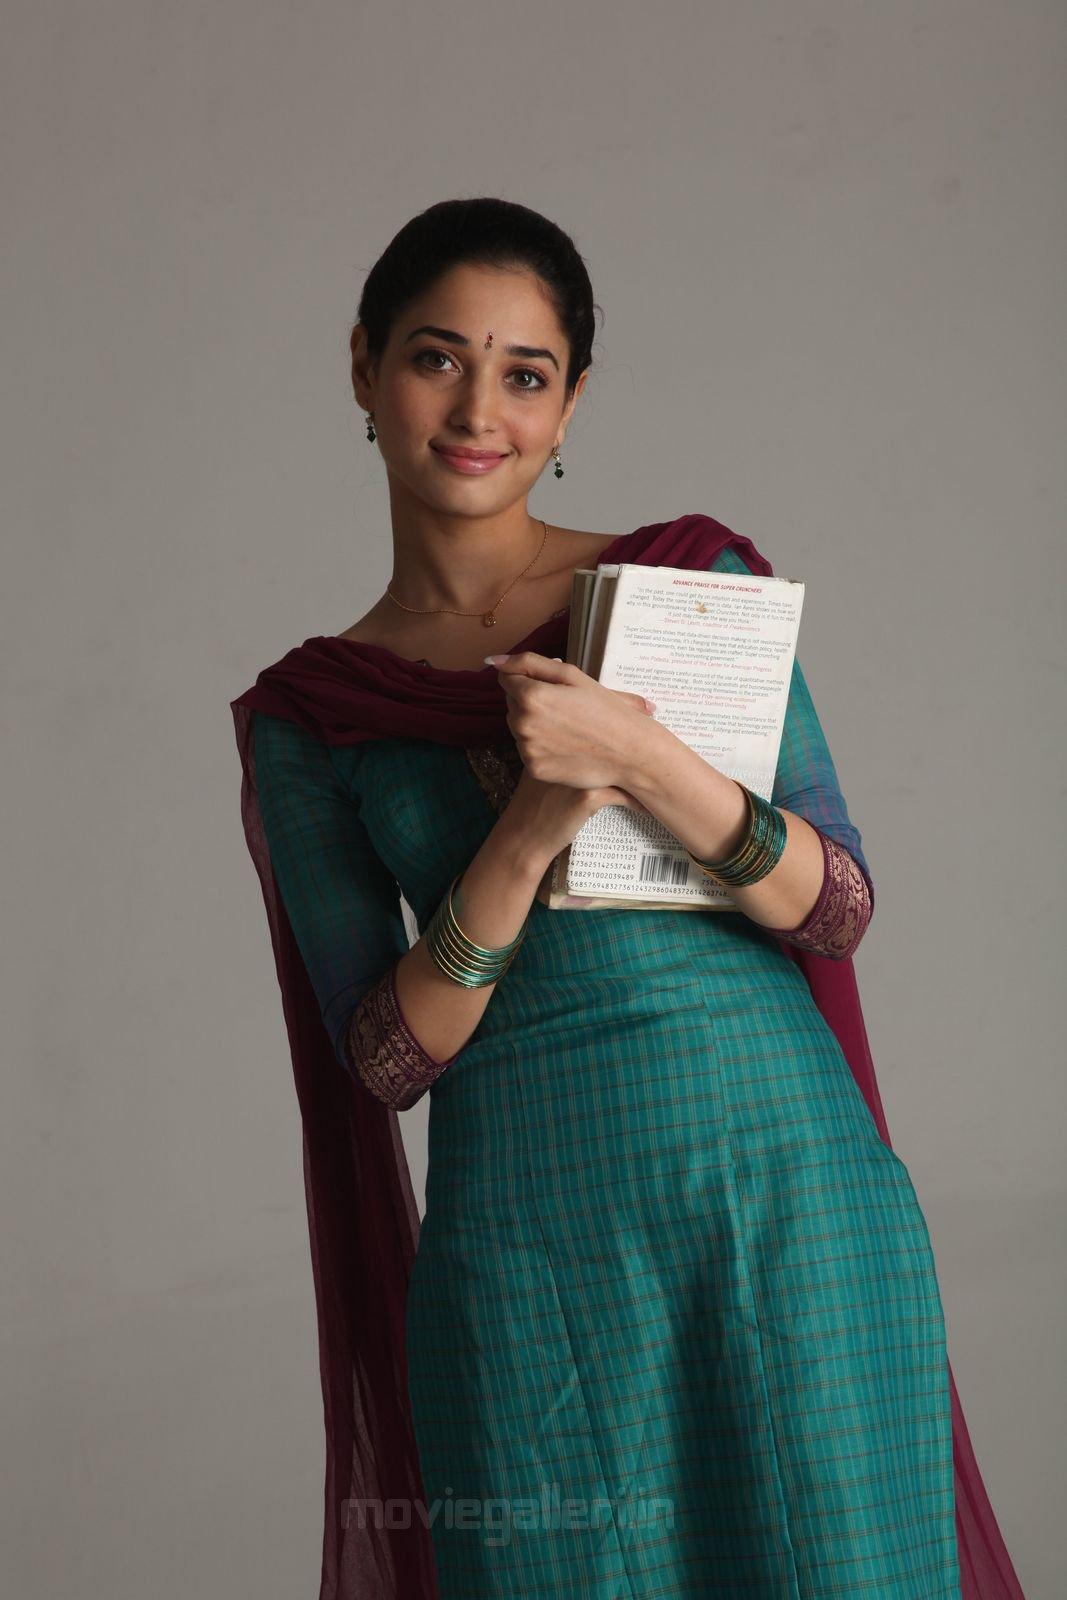 tamanna beautiful photo shoot stills in salwar kameez | new movie